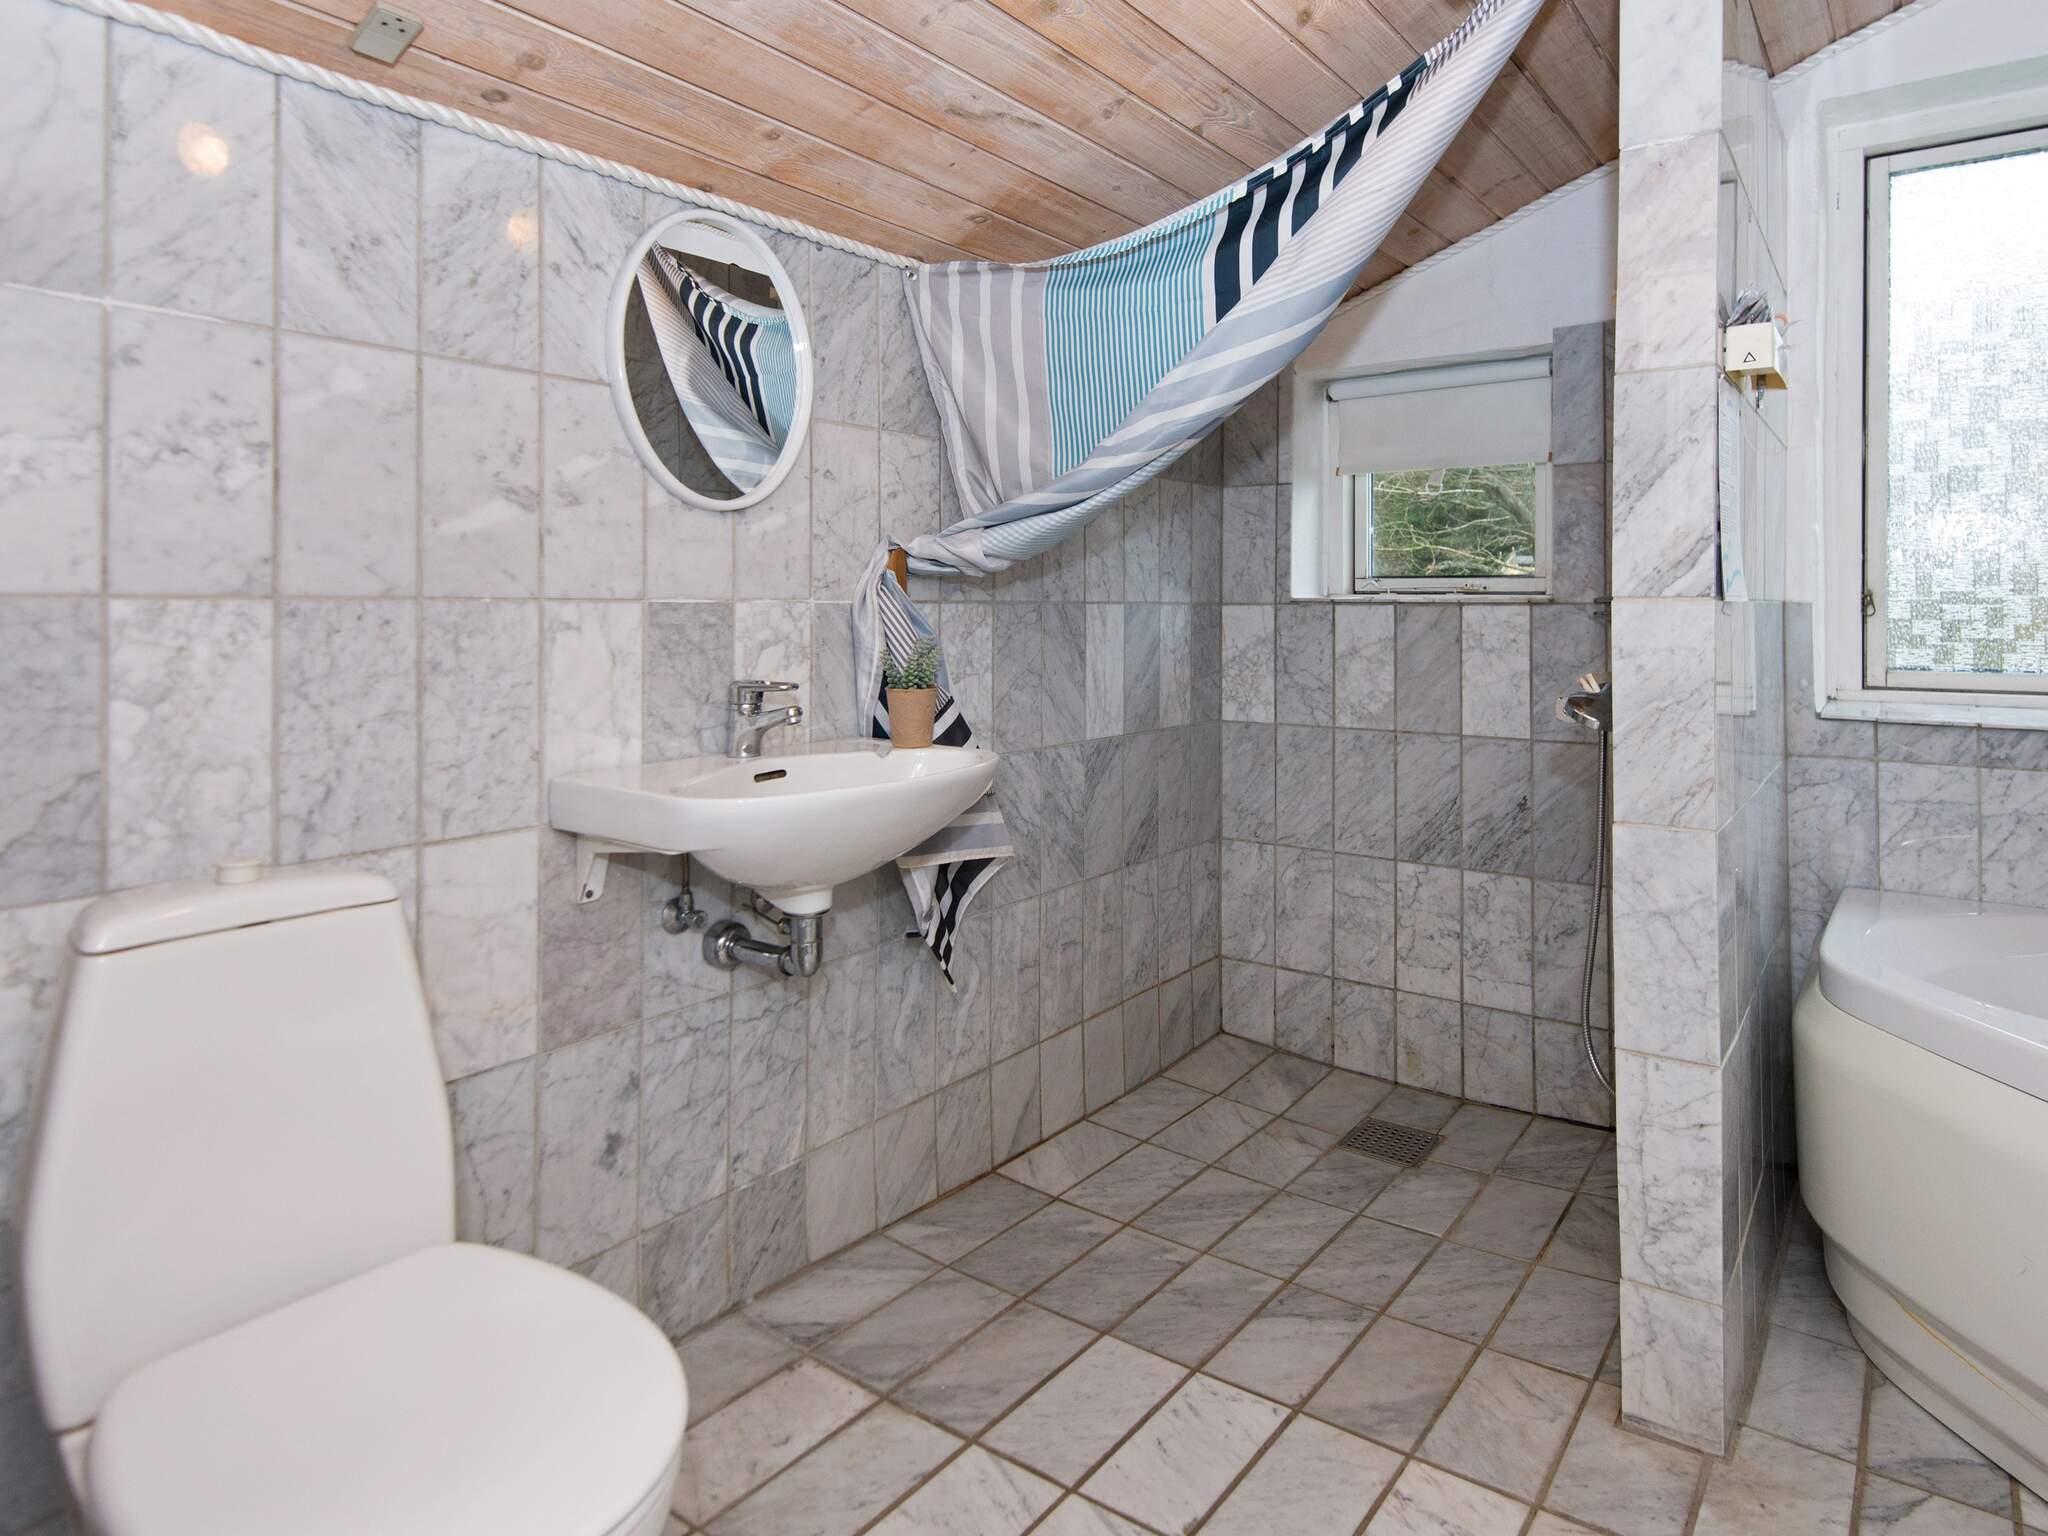 Ferienhaus Handrup Bakker (2368262), Handrup, , Dänische Ostsee, Dänemark, Bild 14